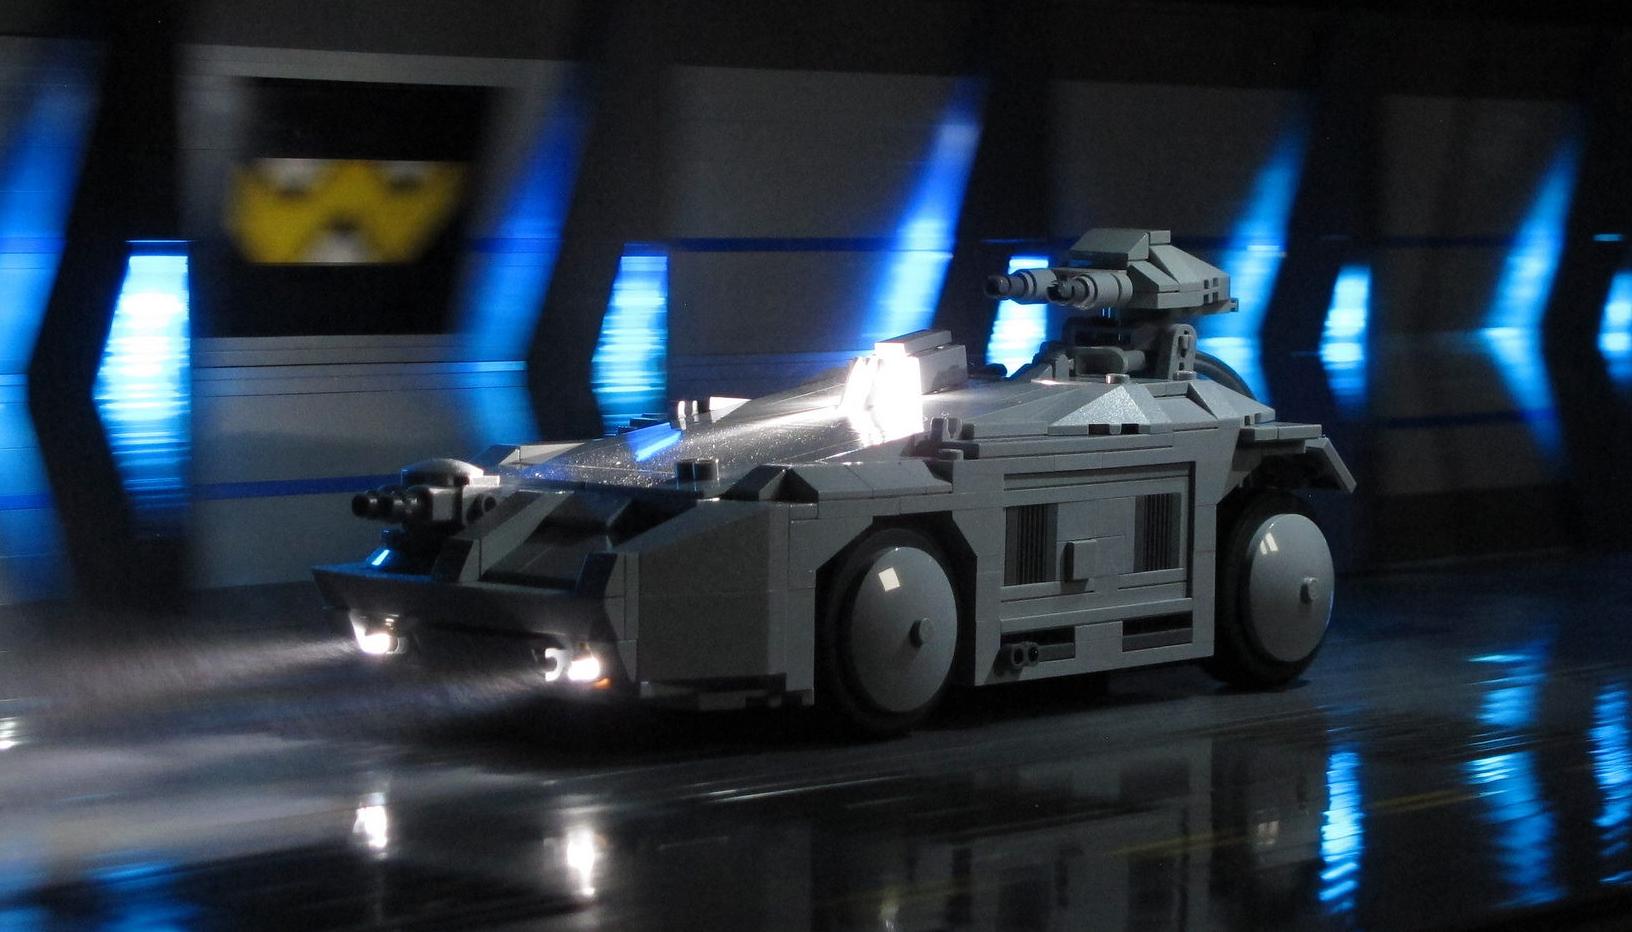 Lego Aliens : Missing Brick